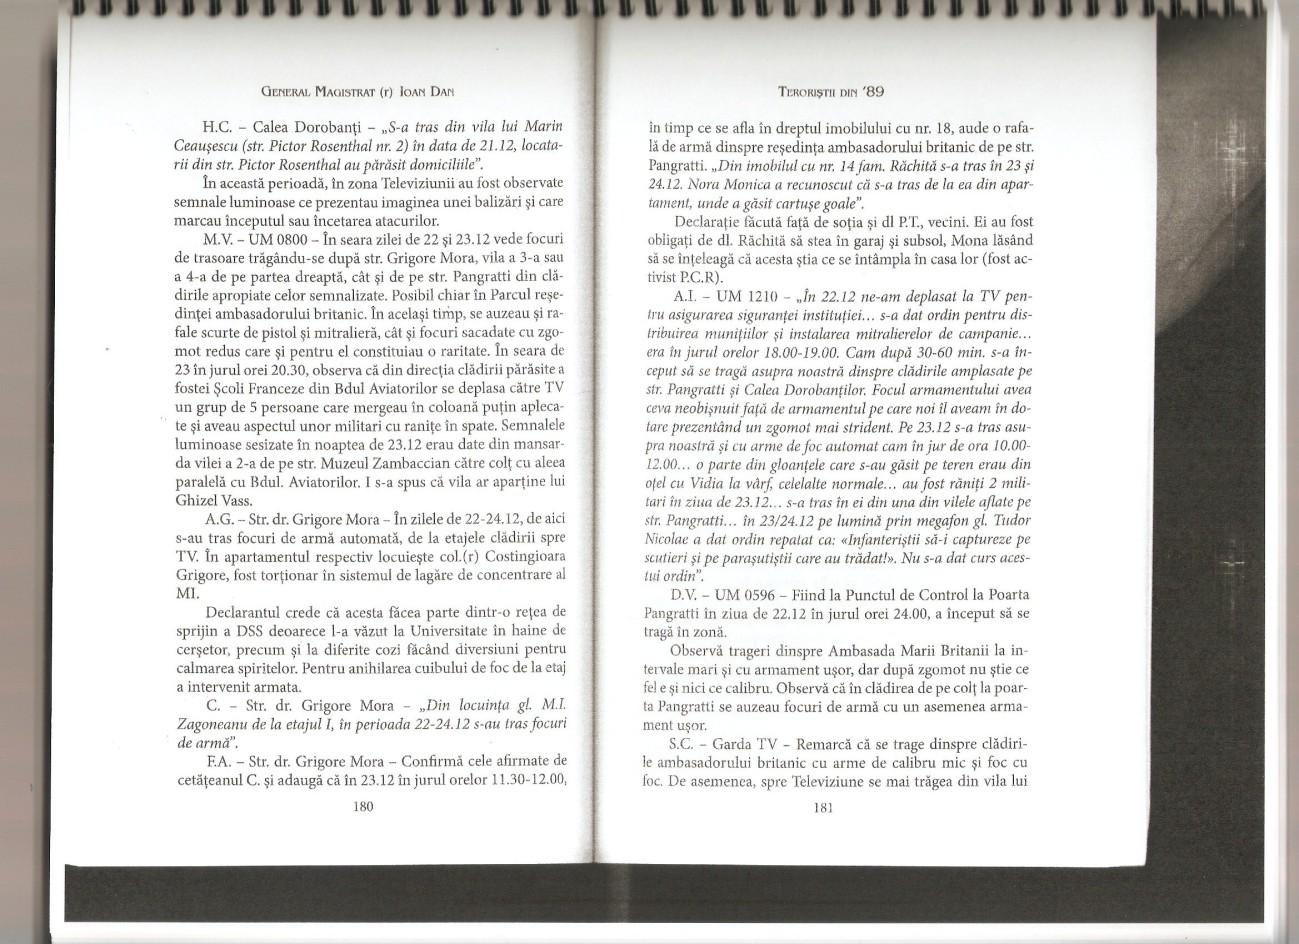 https://romanianrevolutionofdecember1989.files.wordpress.com/2013/12/image0-0011-e1386119243937.jpg?w=1299&h=944